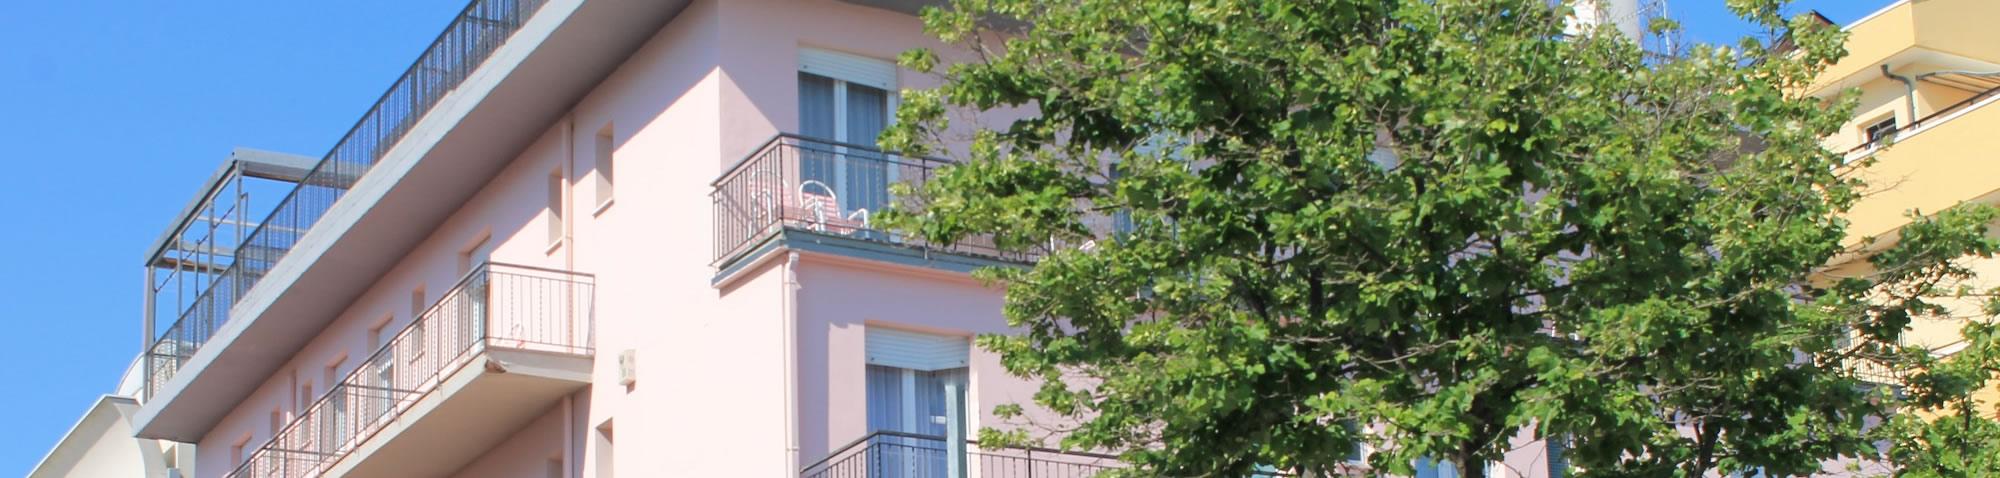 B&B Hotel 3 Stelle a Rimini